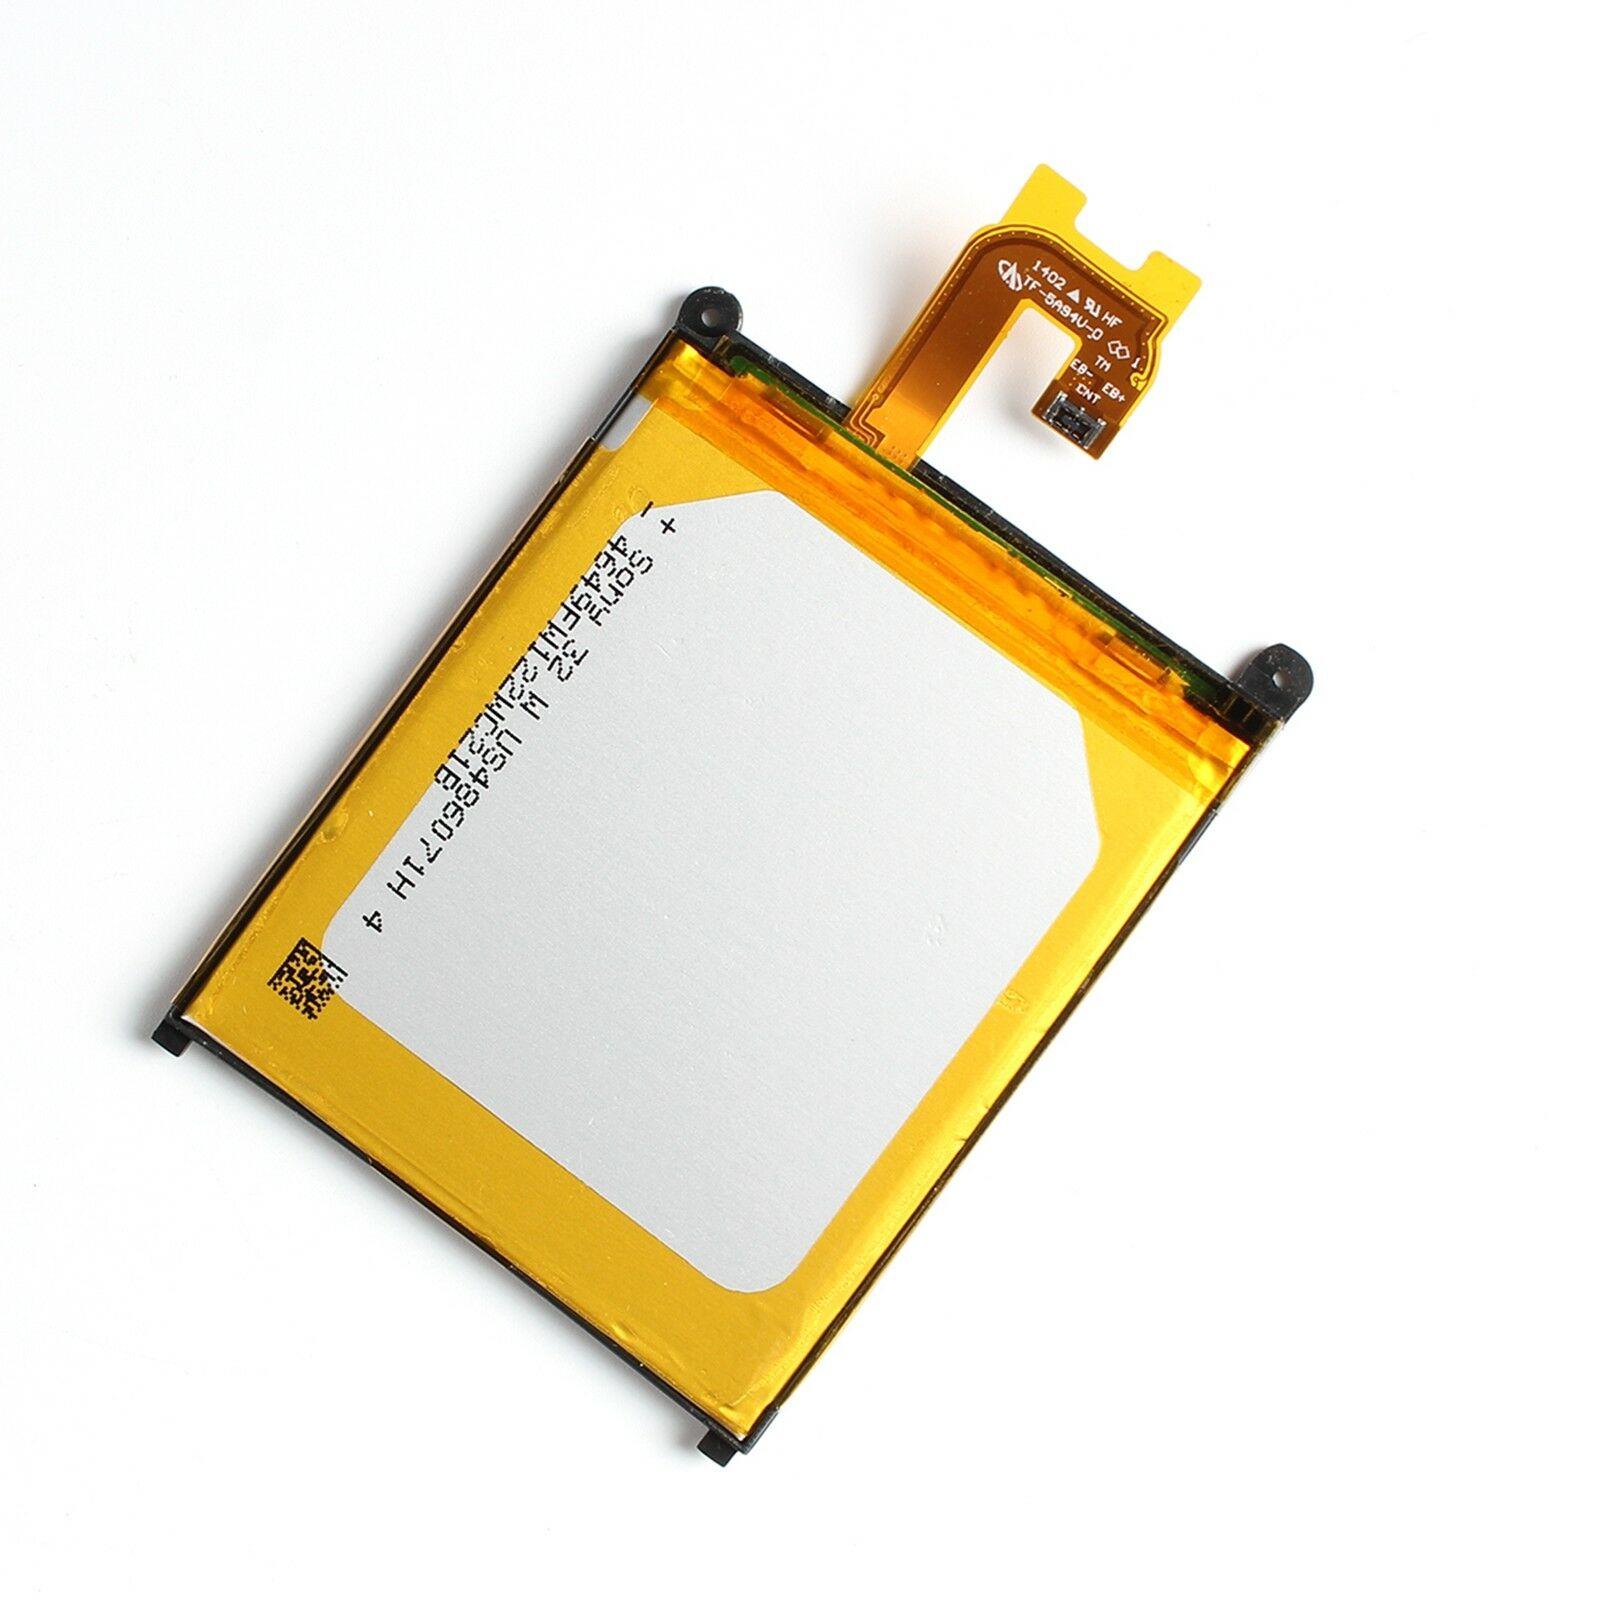 باتری-گوشی-موبایل-سونی-اکسپریا-زد-تو-Sony-Xperia-Z2-D6503-3200mAh-LIS1543ERPC....jpg